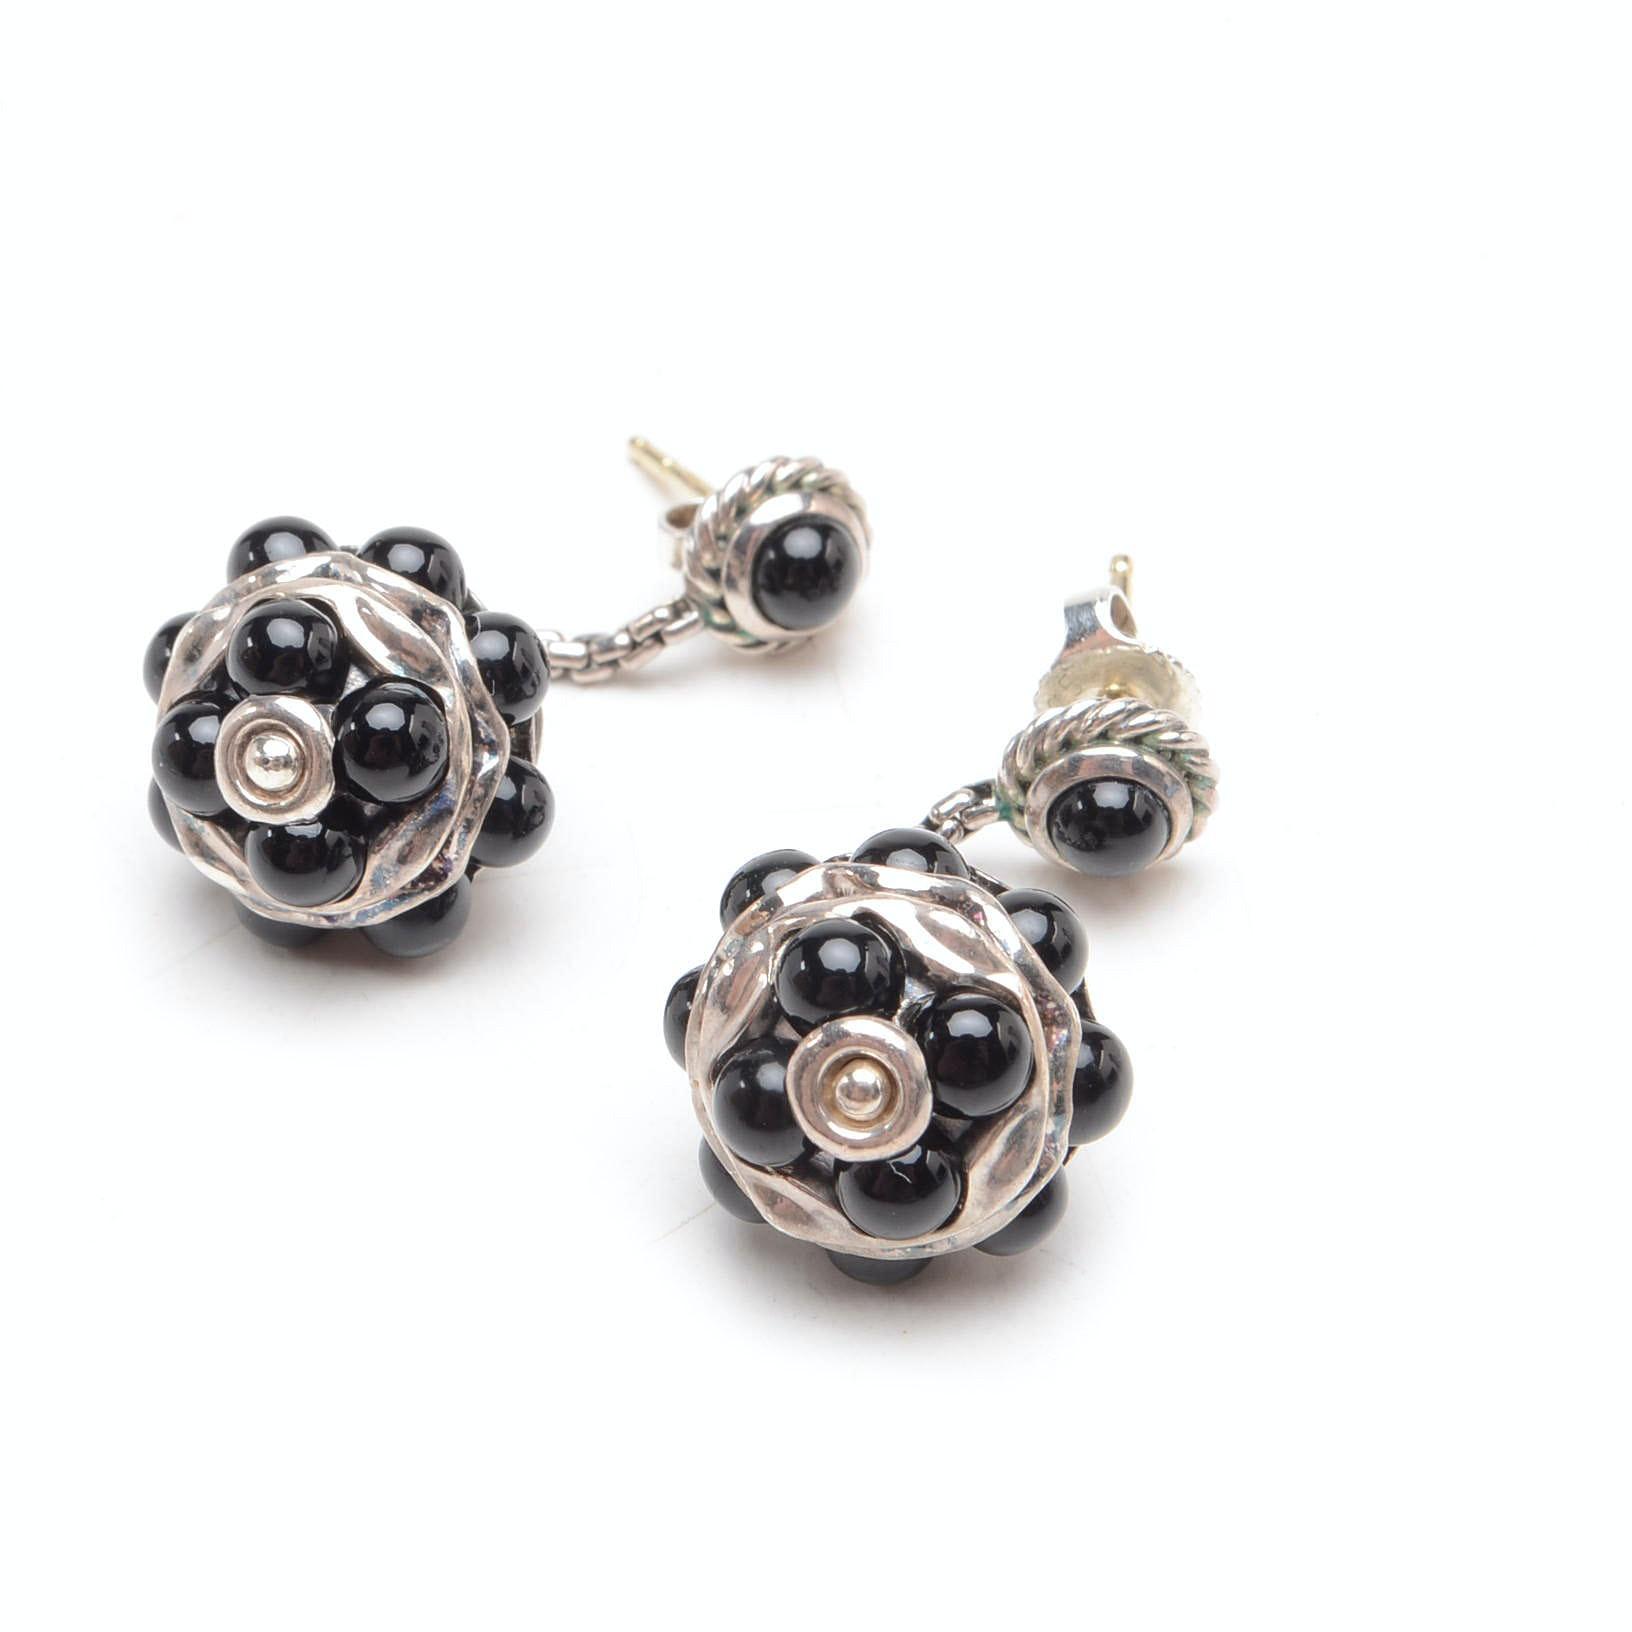 David Yurman Diamond, Onyx, and Sterling Silver Earrings